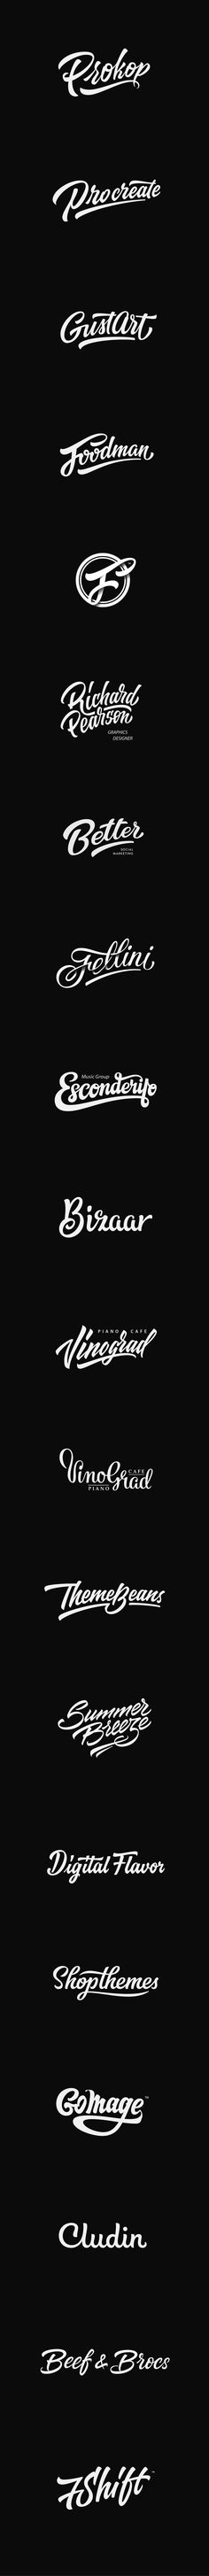 Lettering logotypes , compilation 1 by Евгений Тутов, via Behance